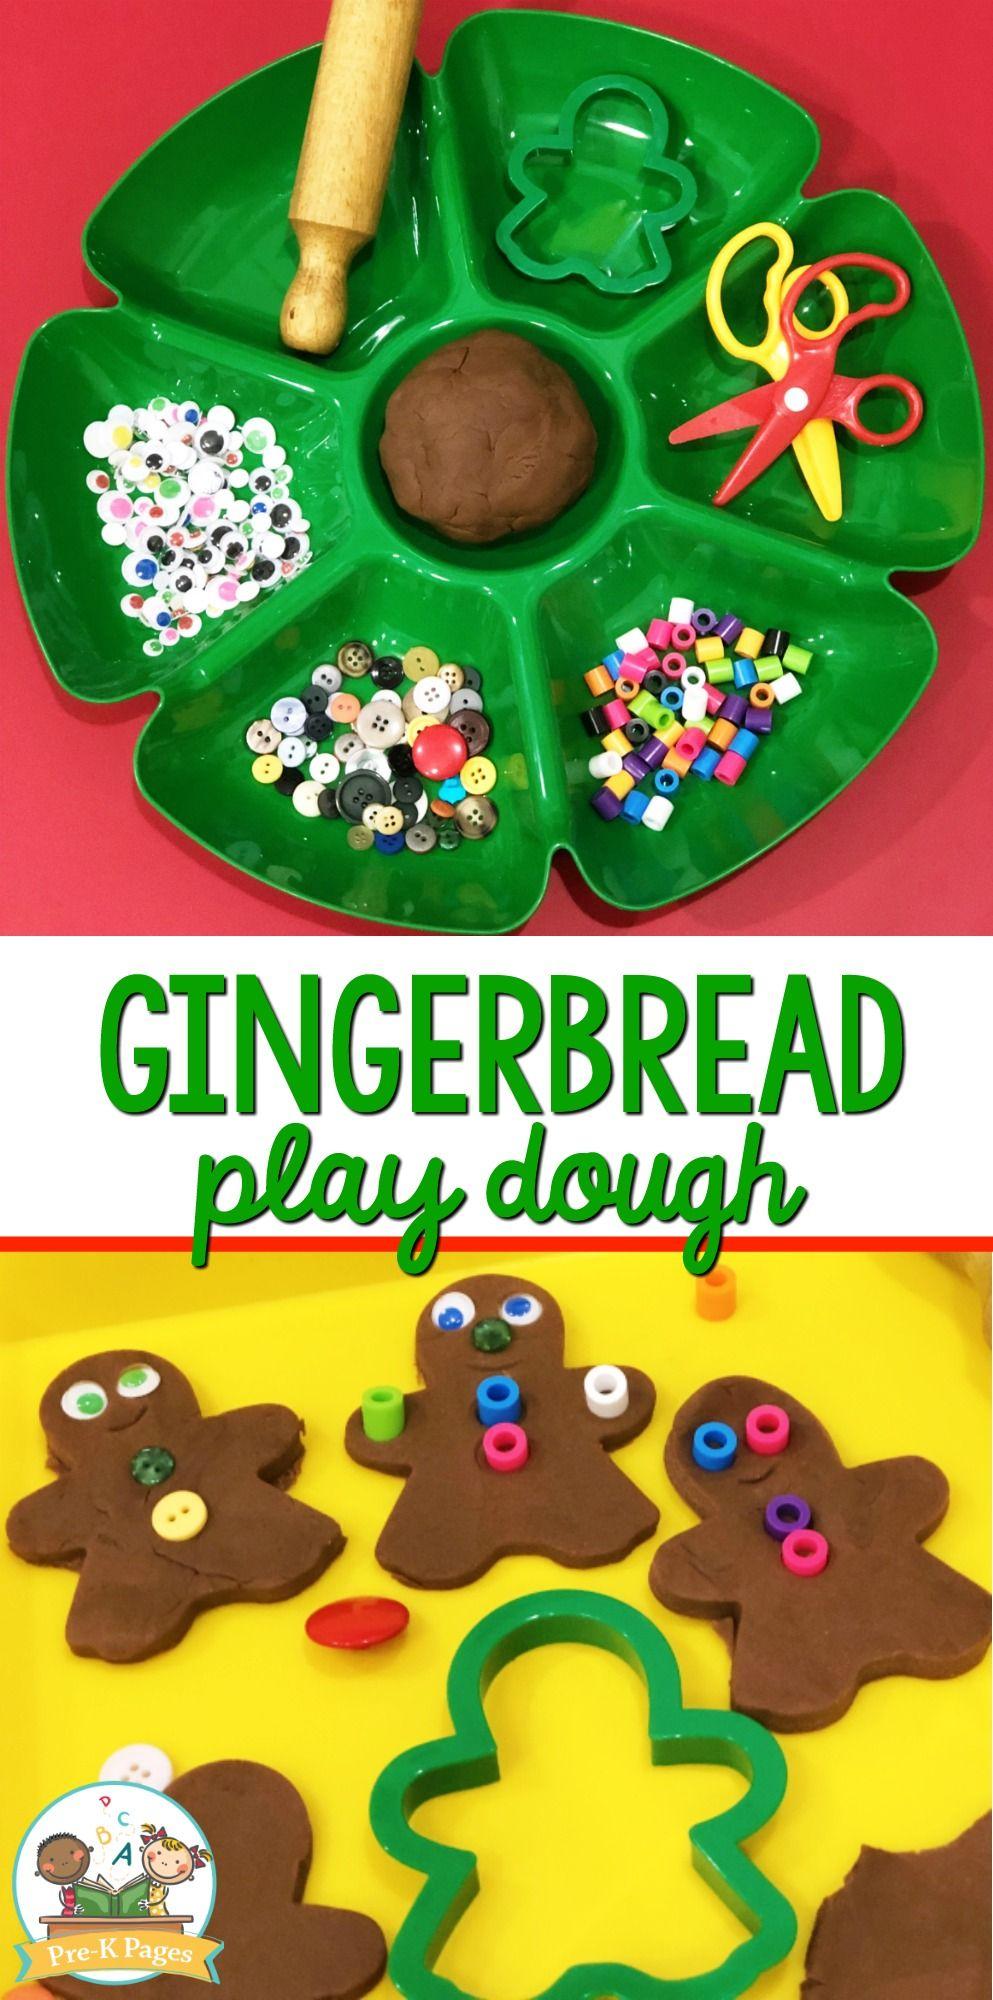 Gingerbread Playdough Recipe For Preschool Gingerbread Activities Gingerbread Man Preschool Gingerbread Man Activities Gingerbread man art activities for